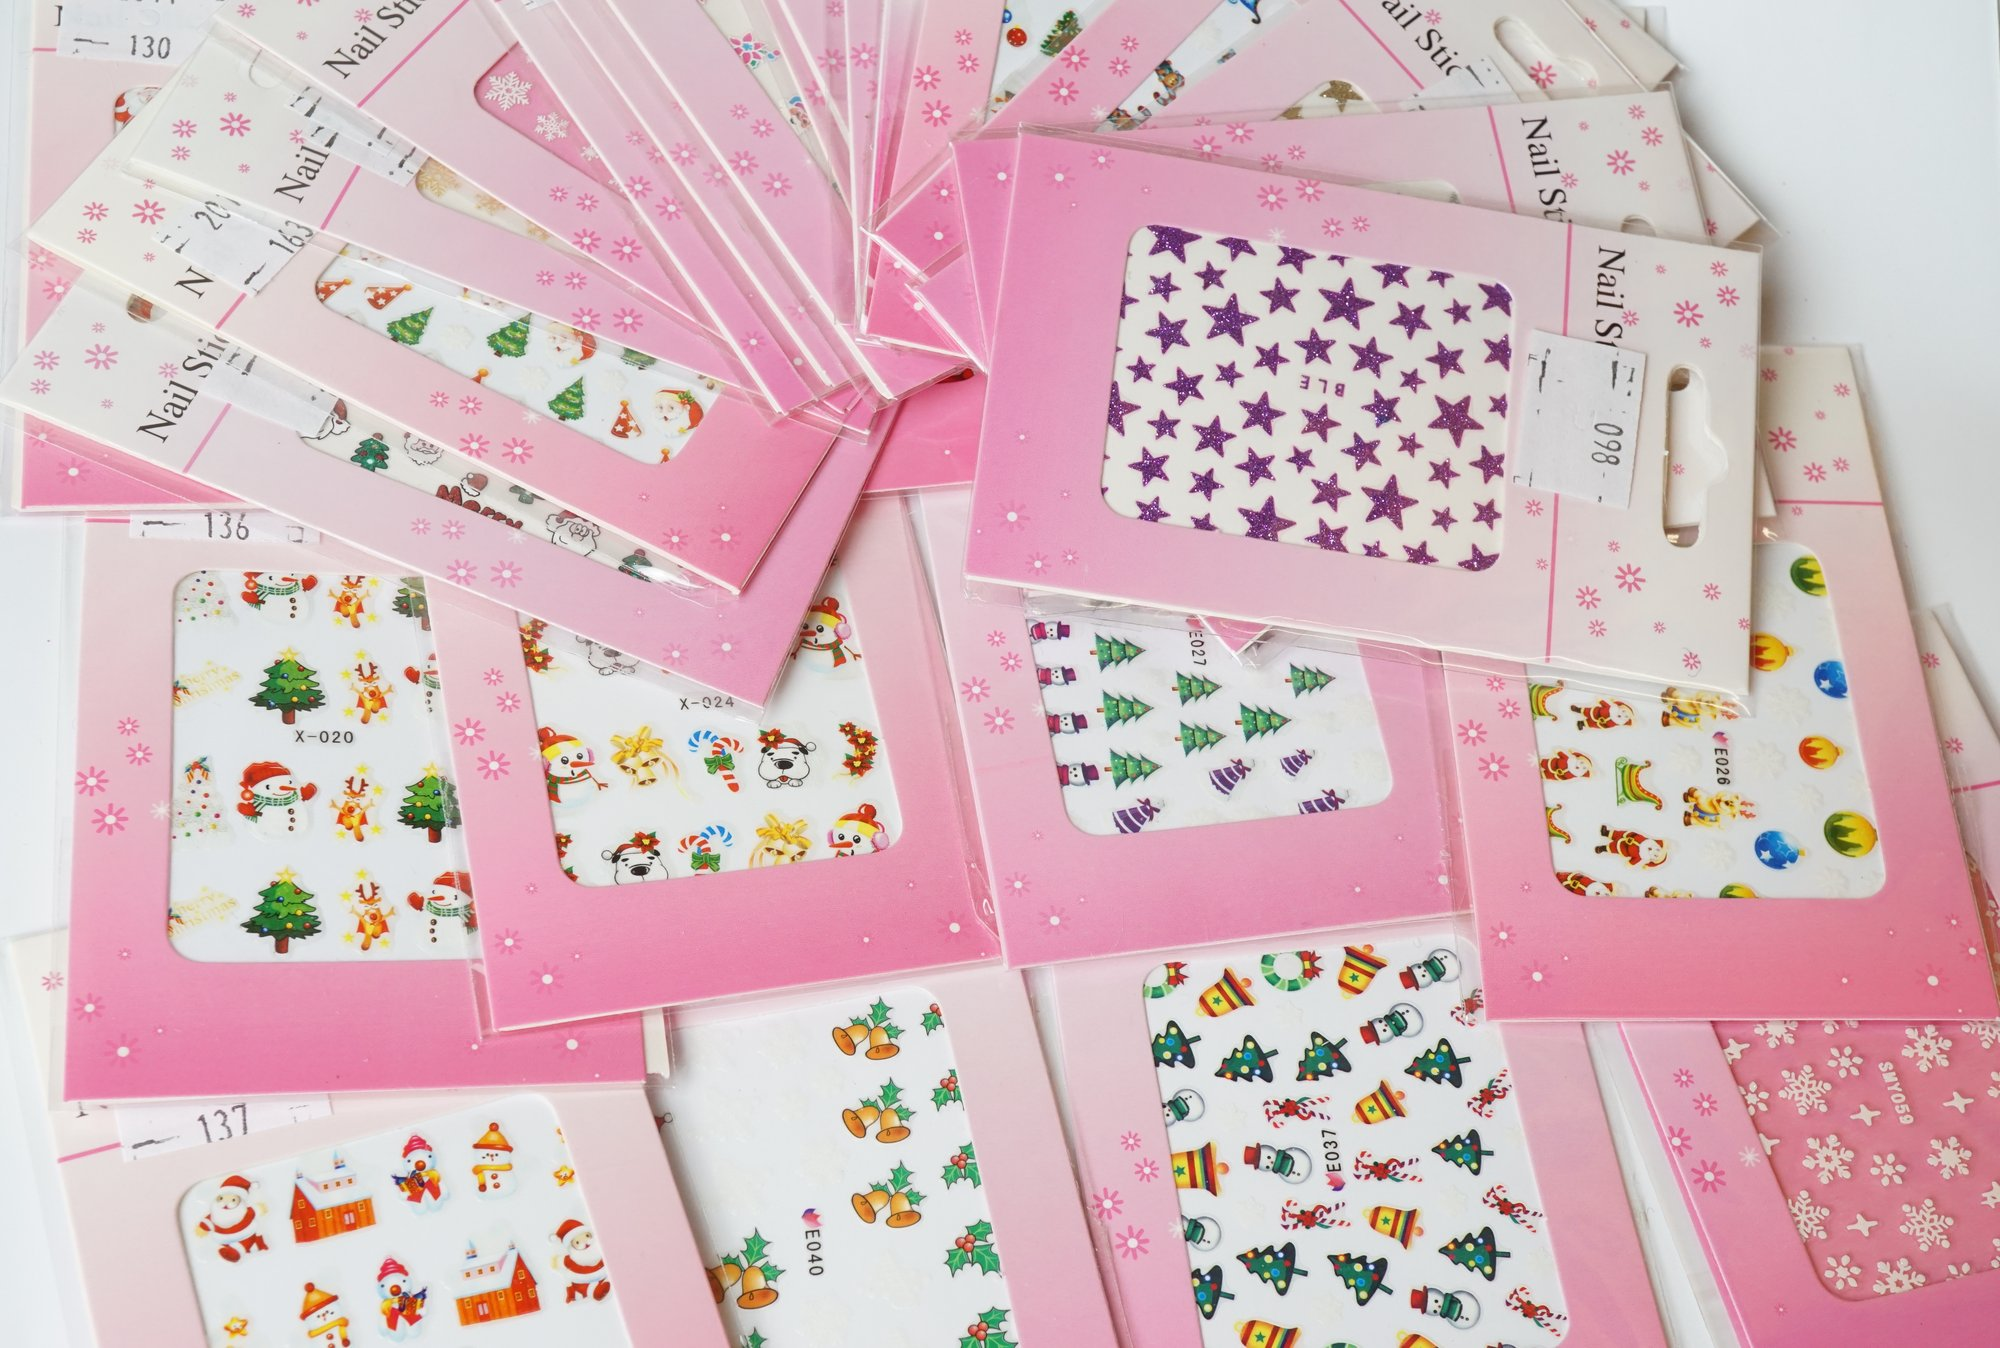 gs nails nail tattoos sticker set weihnachtsmotiv 15 b gen. Black Bedroom Furniture Sets. Home Design Ideas